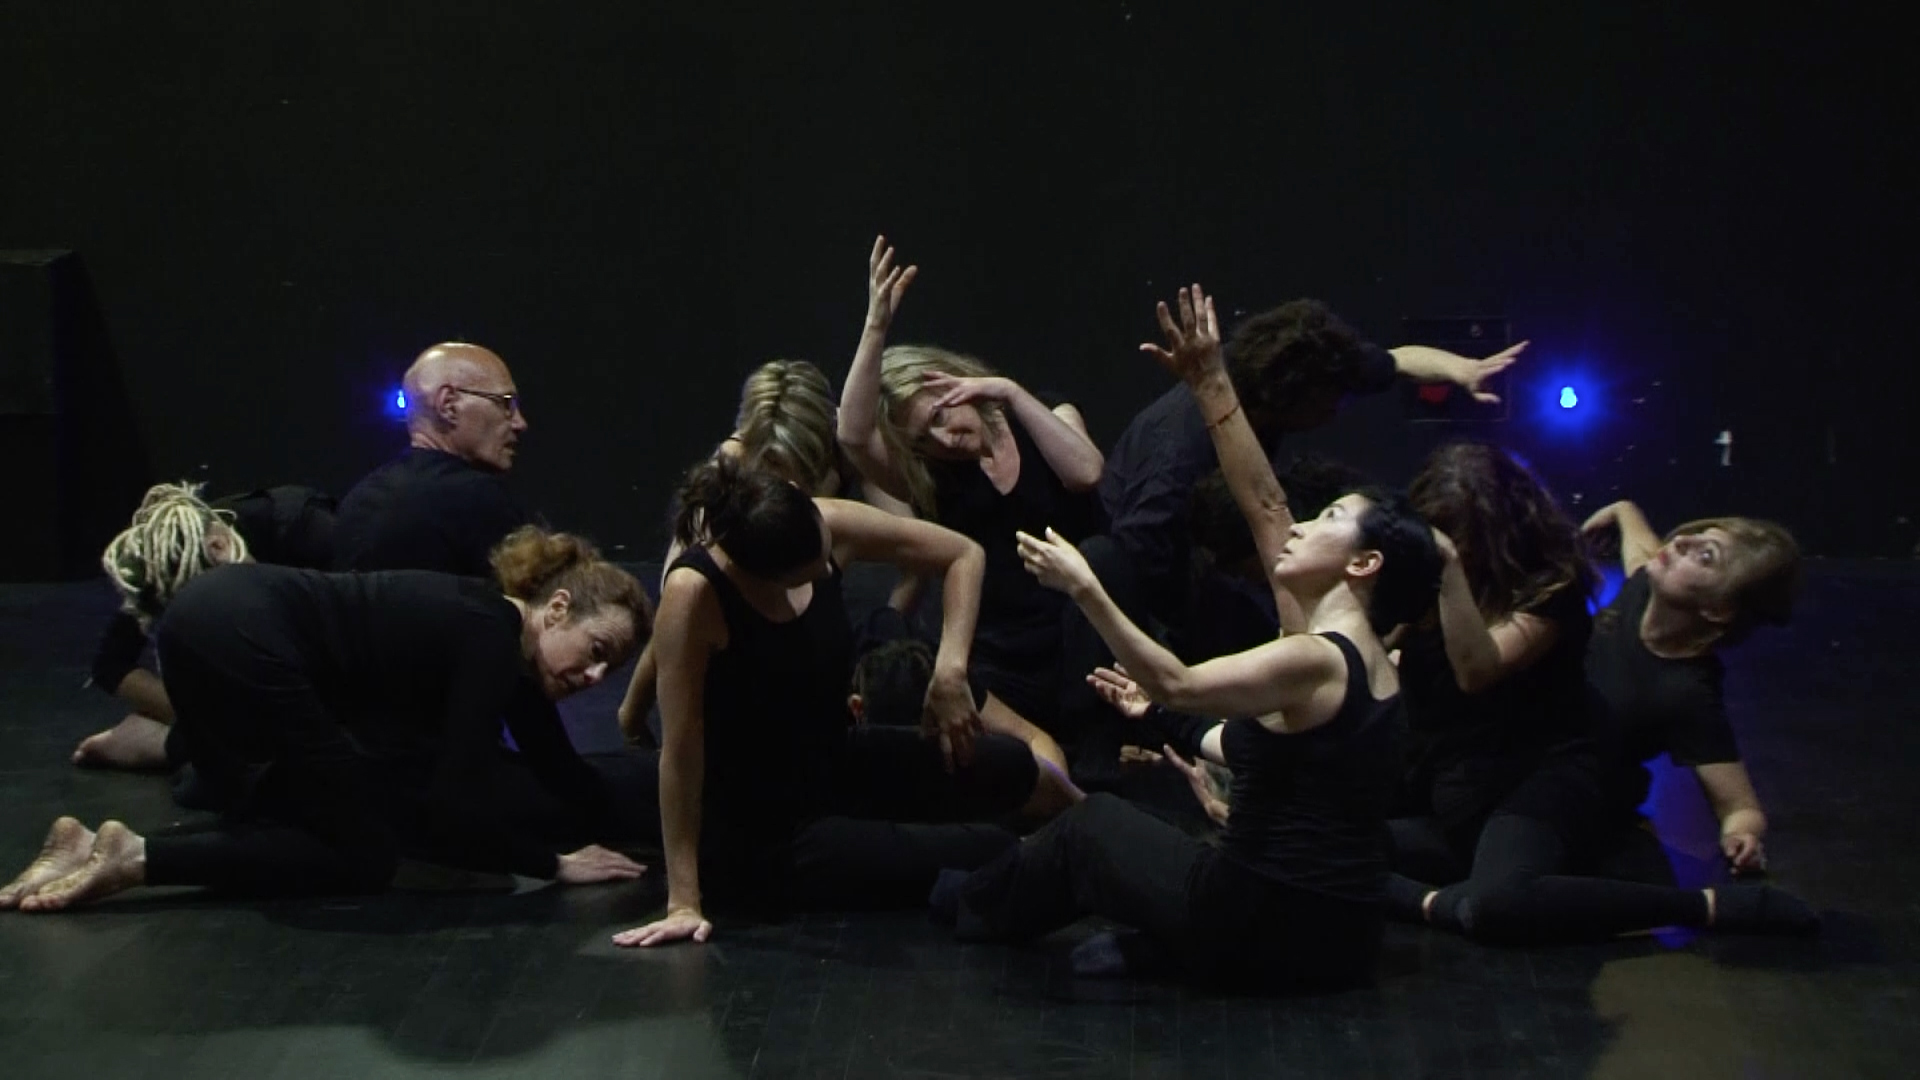 Danse Butô : stage en juillet avec Juju Alishina Micadanses Paris